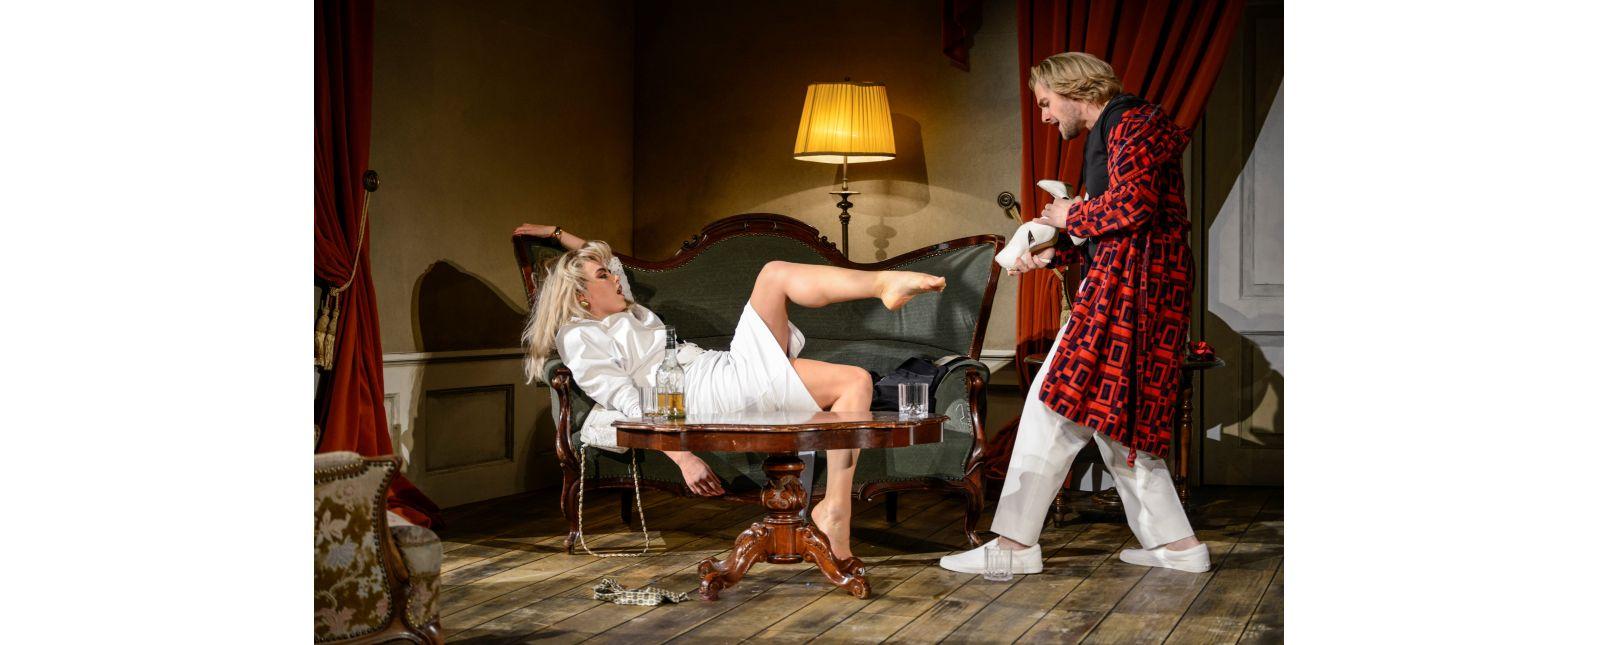 Die Fledermaus // Solen Mainguené // Joshua Kohl // 2018 // Tanja Dorendorf // T+T Fotografie